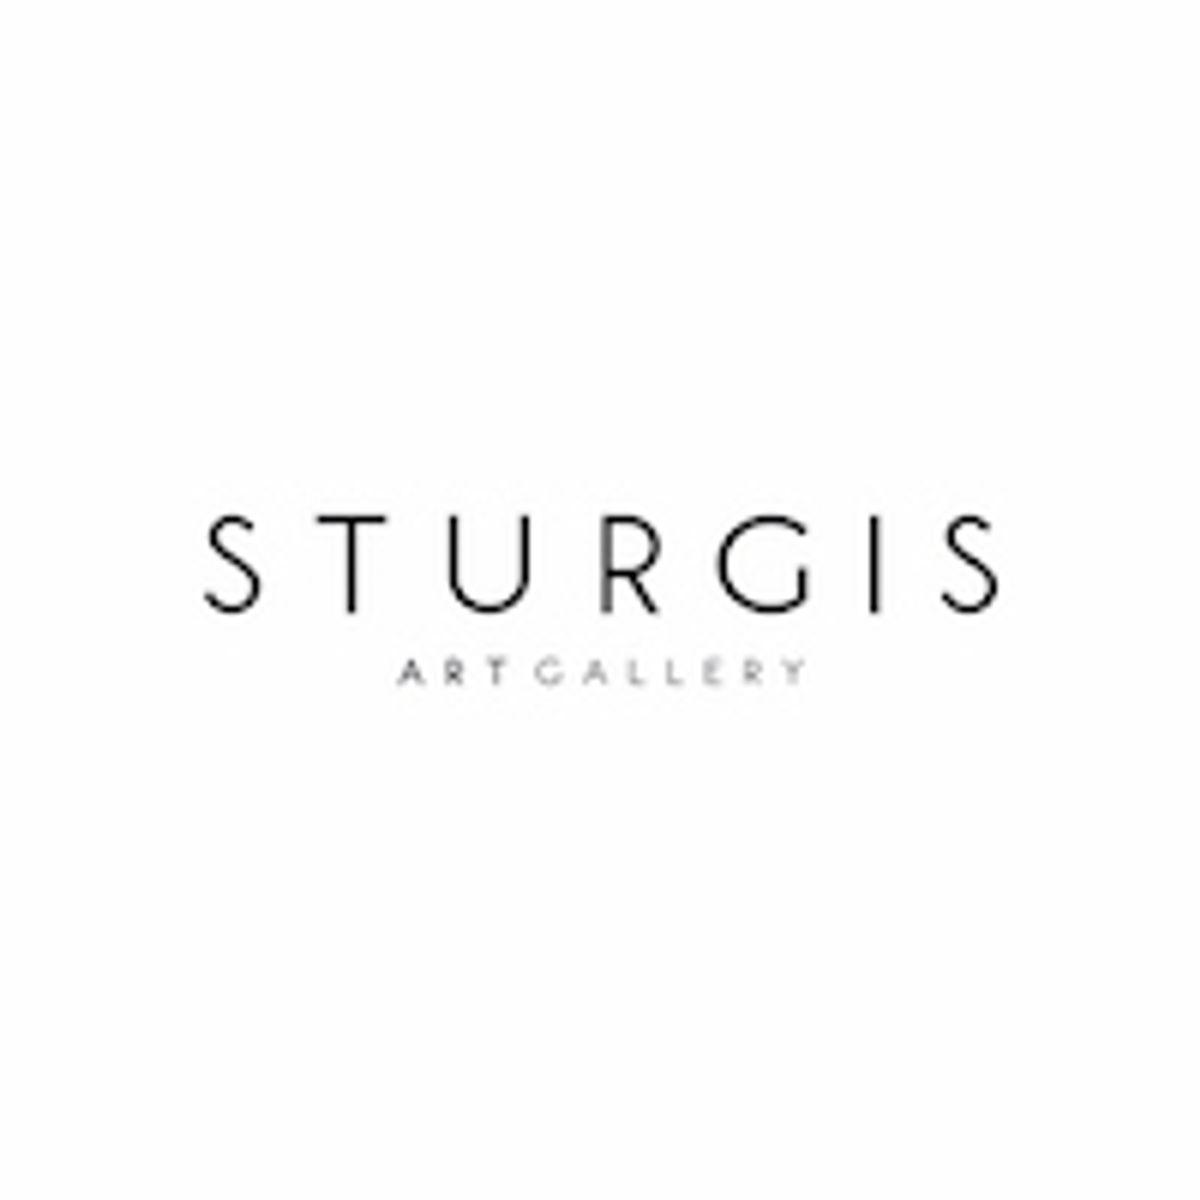 Sturgis Art Gallery